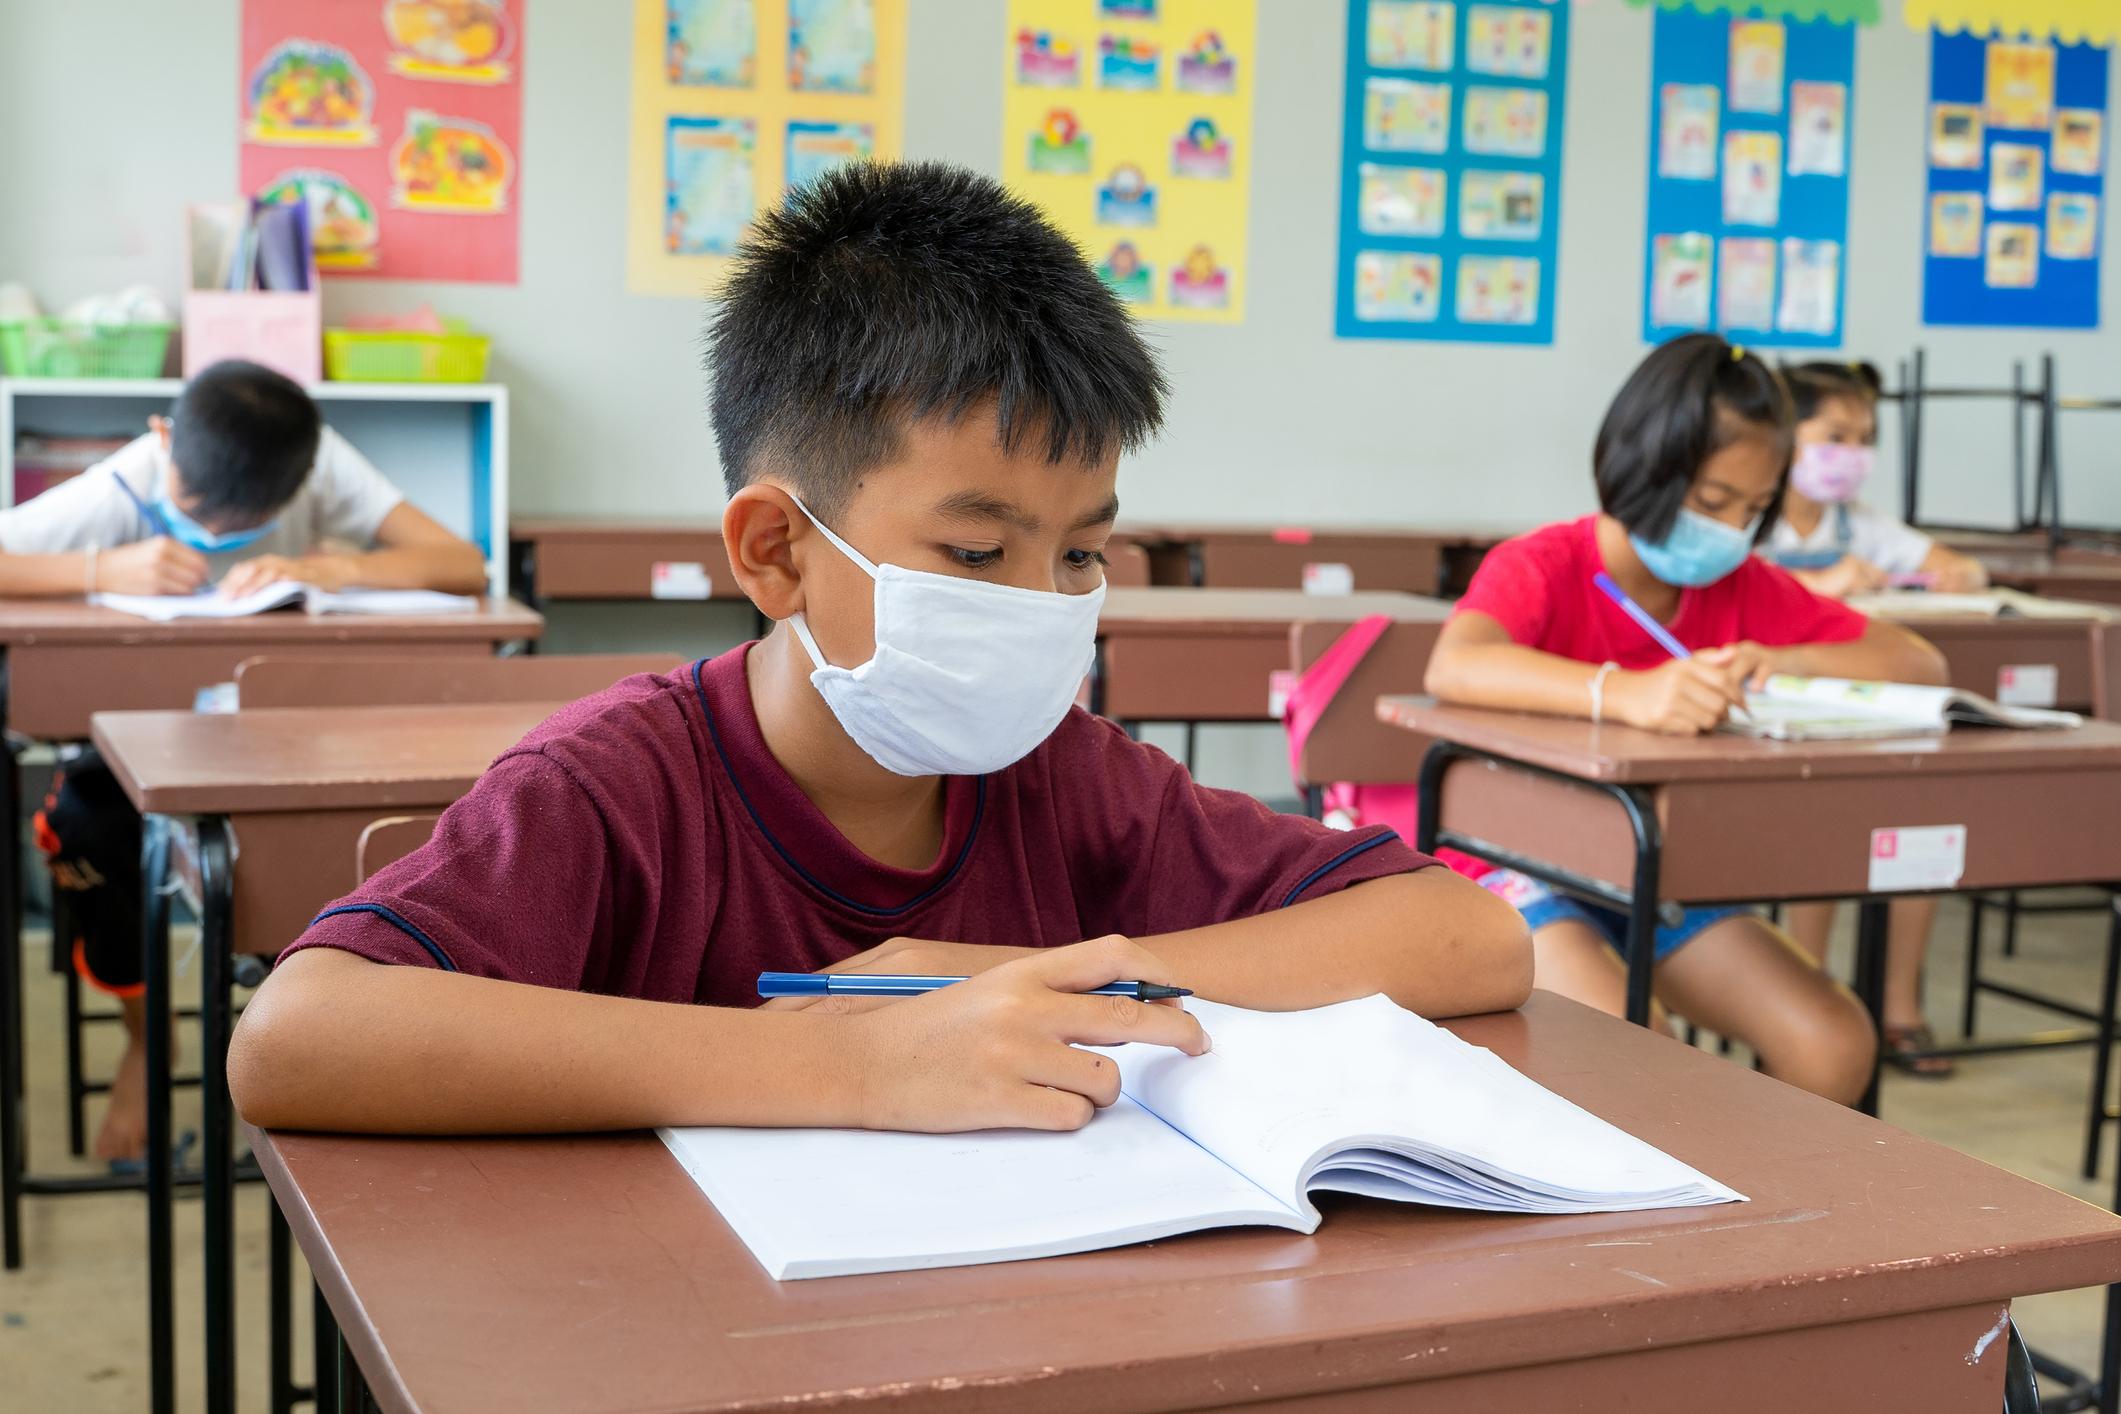 Boston Mayor Kim Janey Says Masks Required in School – NECN